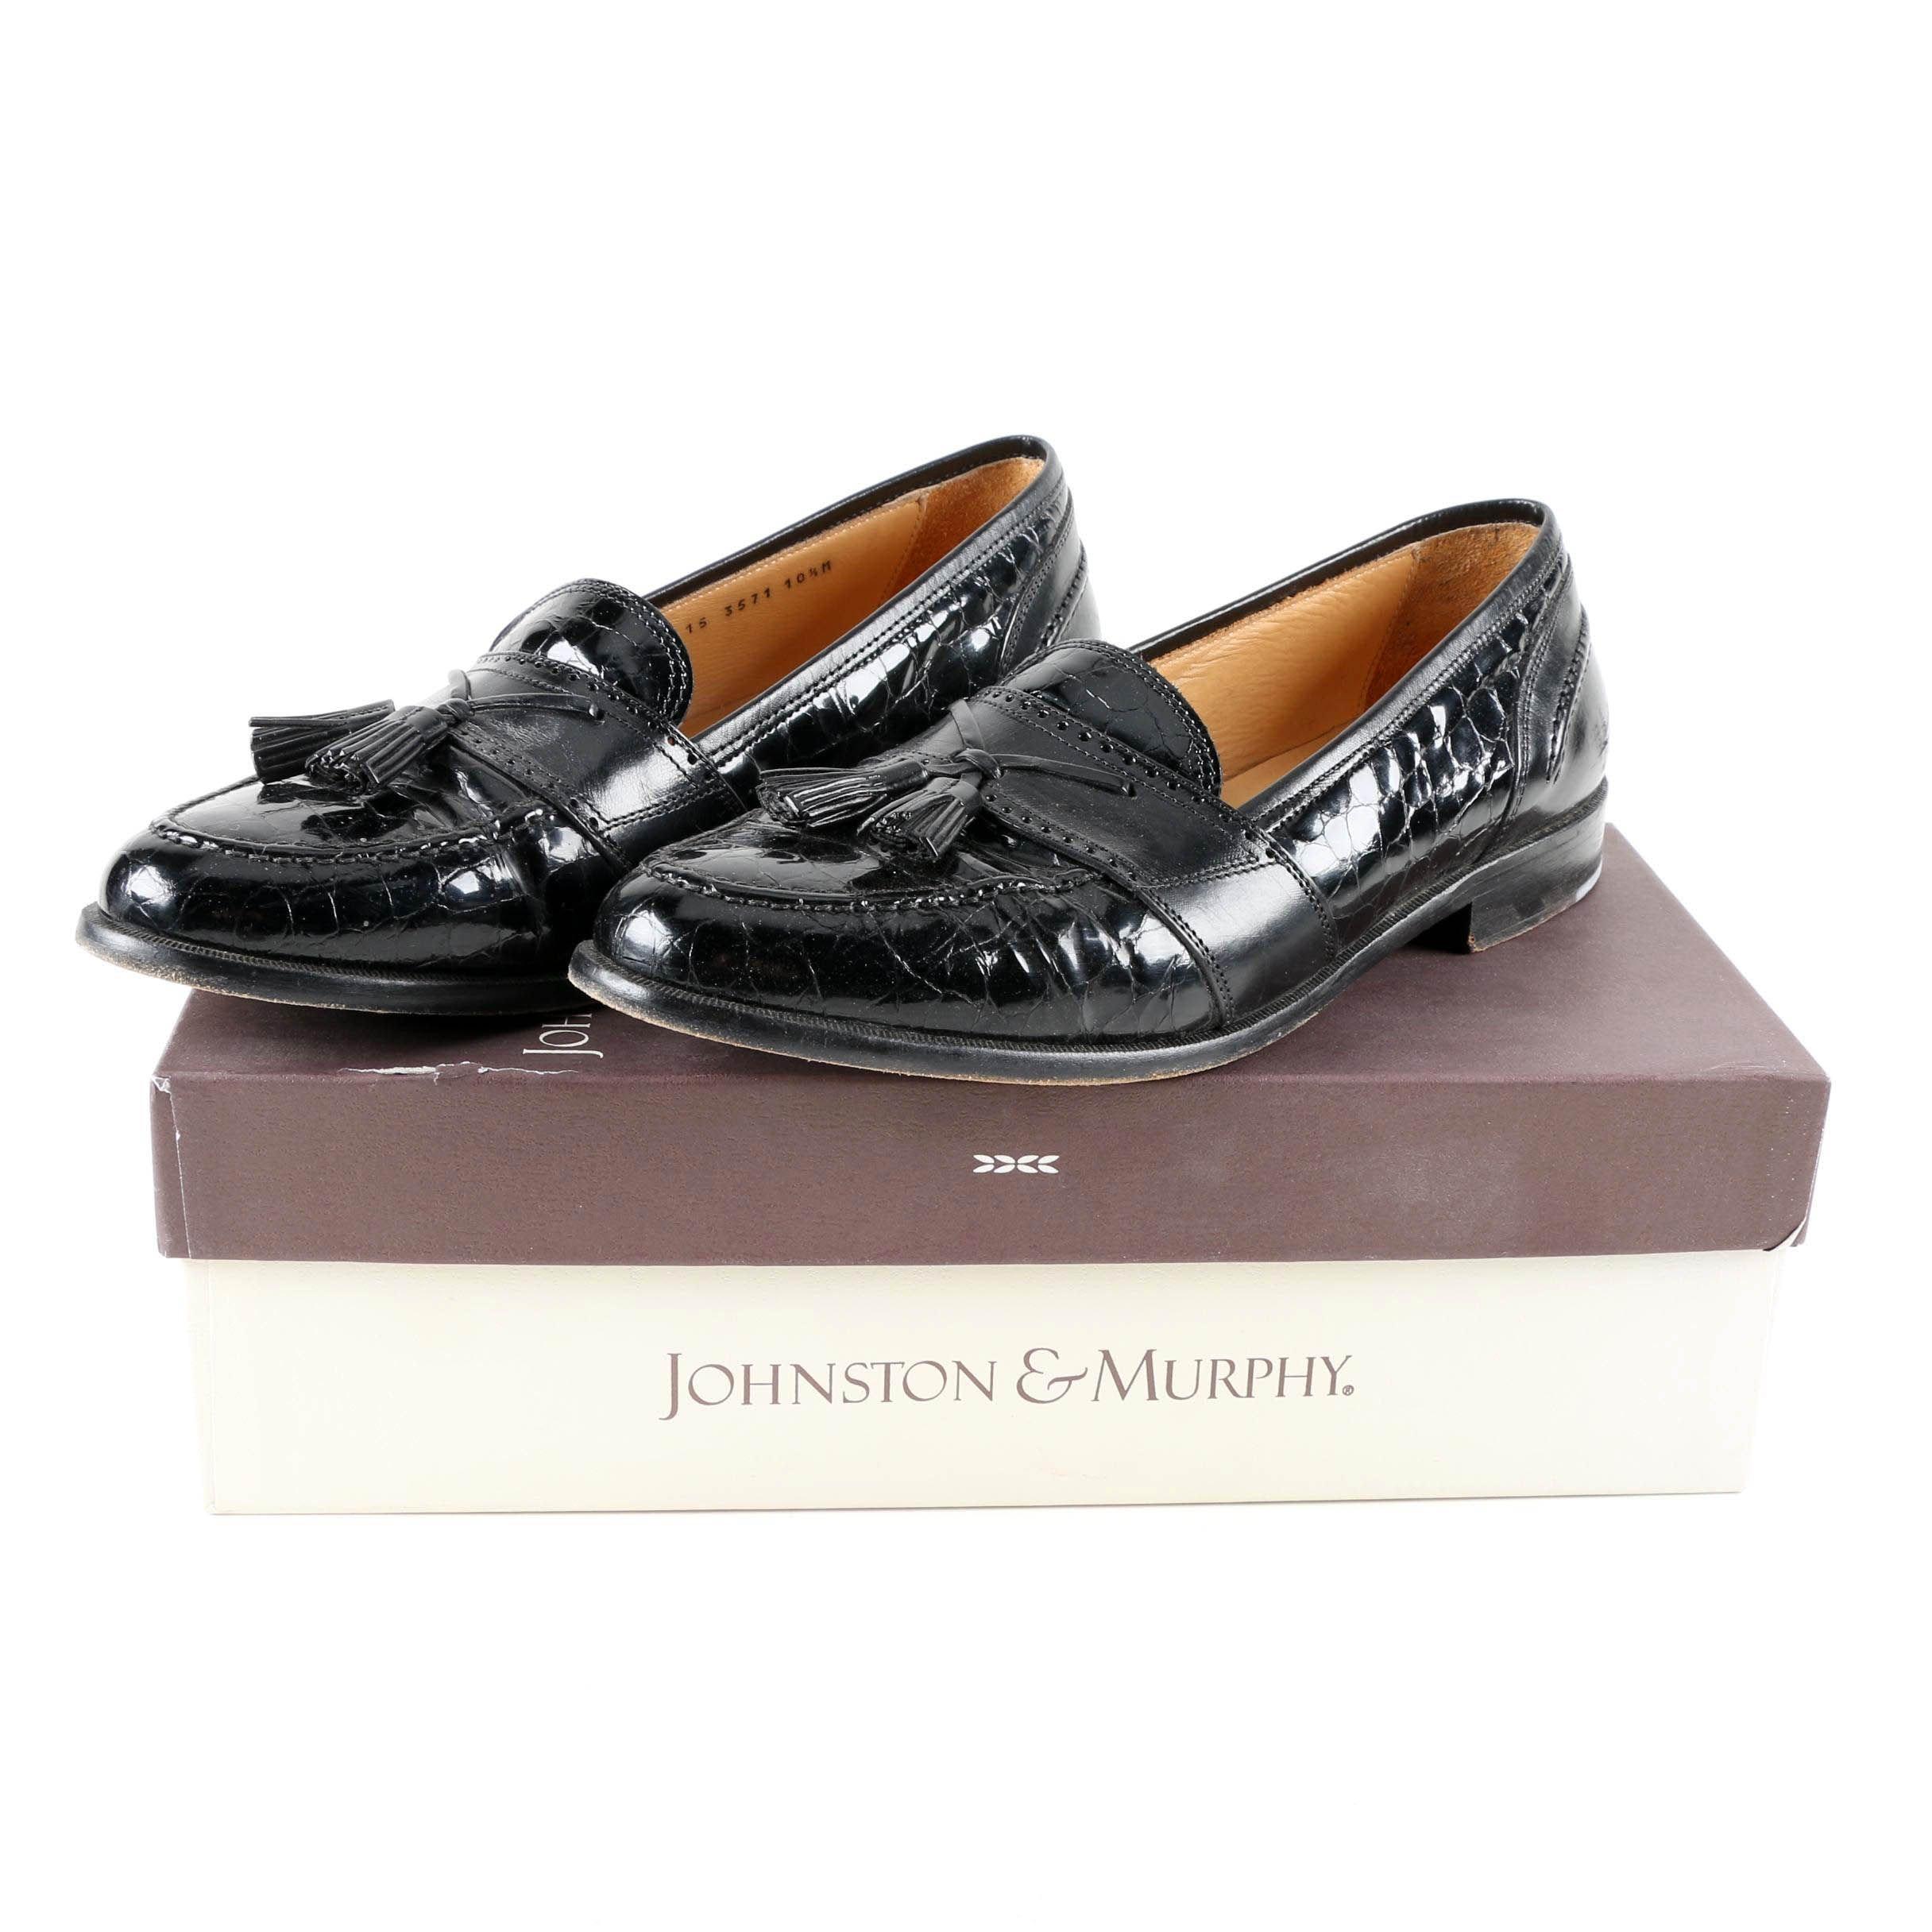 Men's Johnston & Murphy Black Leather Tasseled Loafers